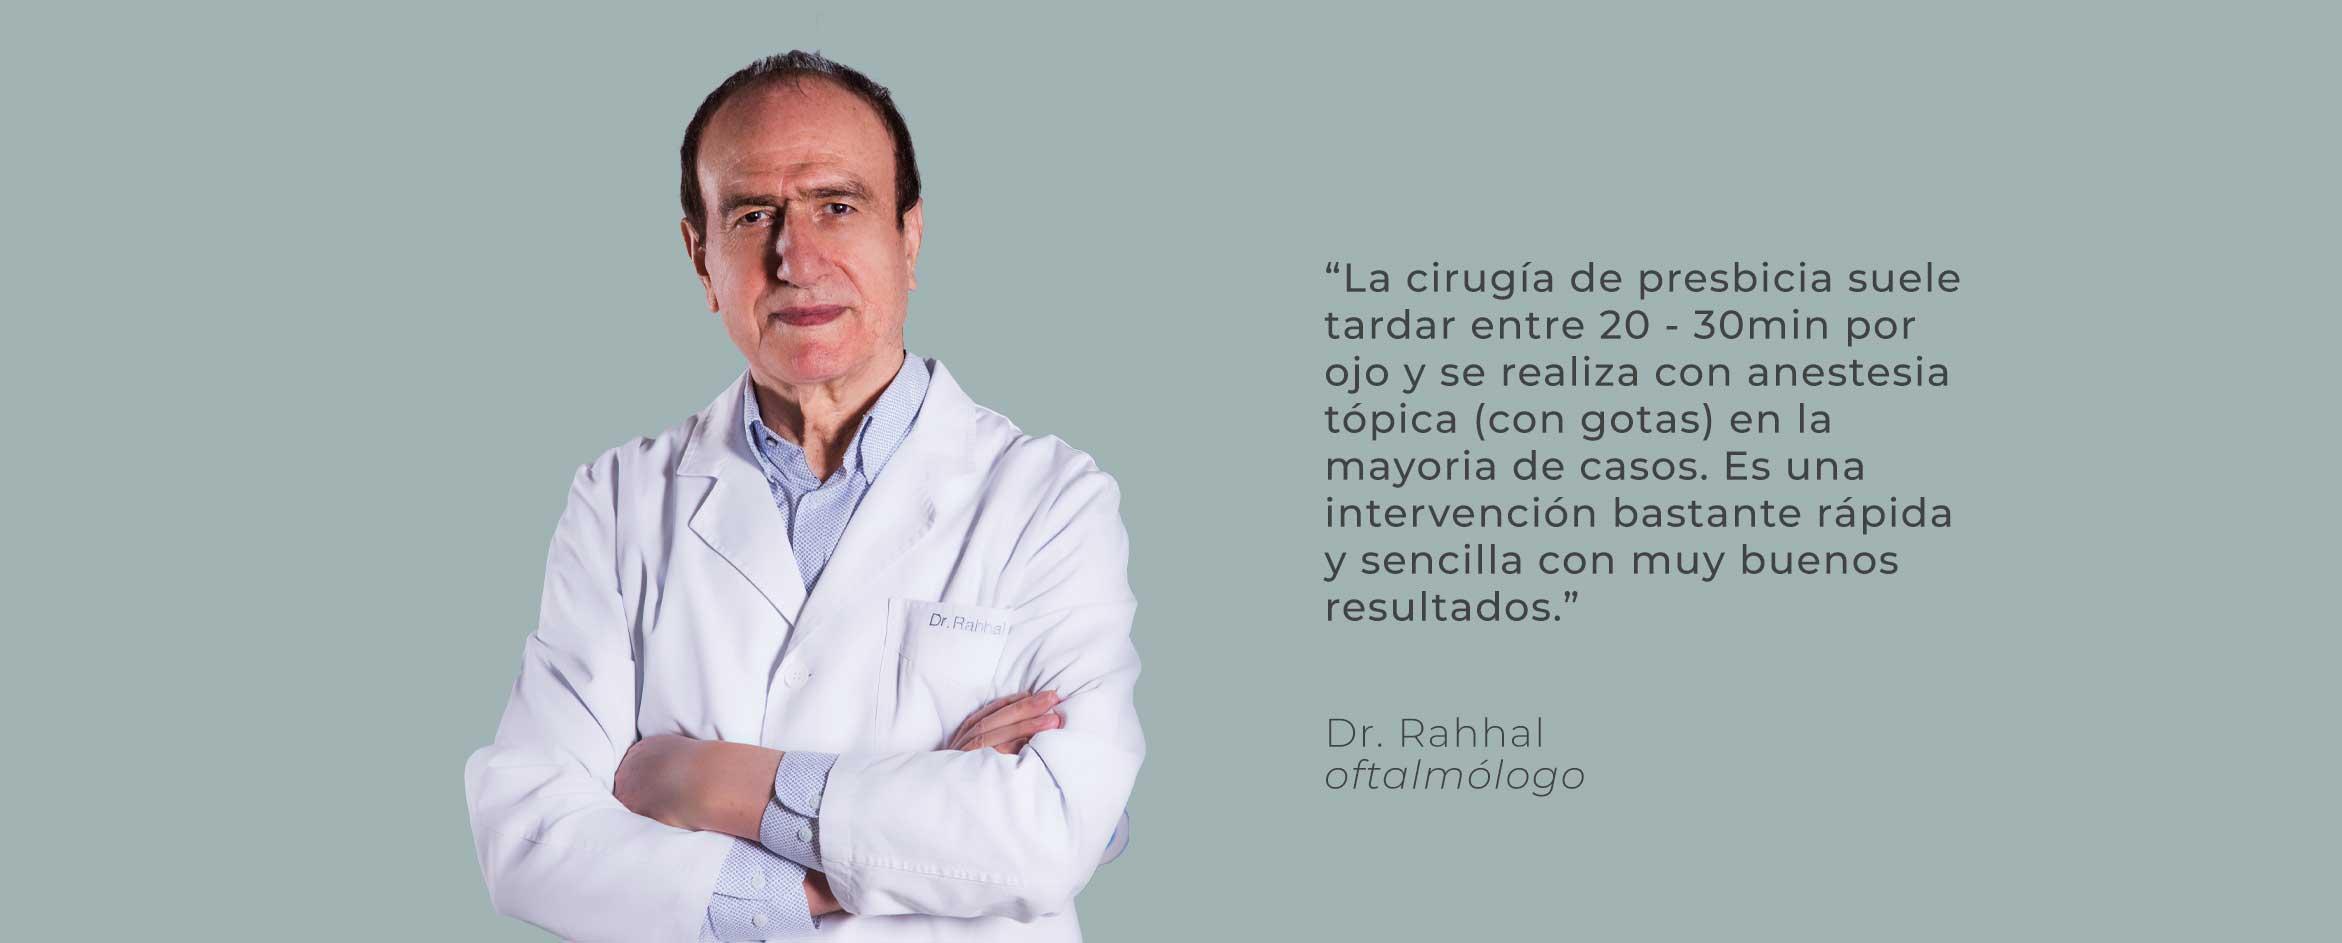 doctor rahhal testimonio cirugía presbicia